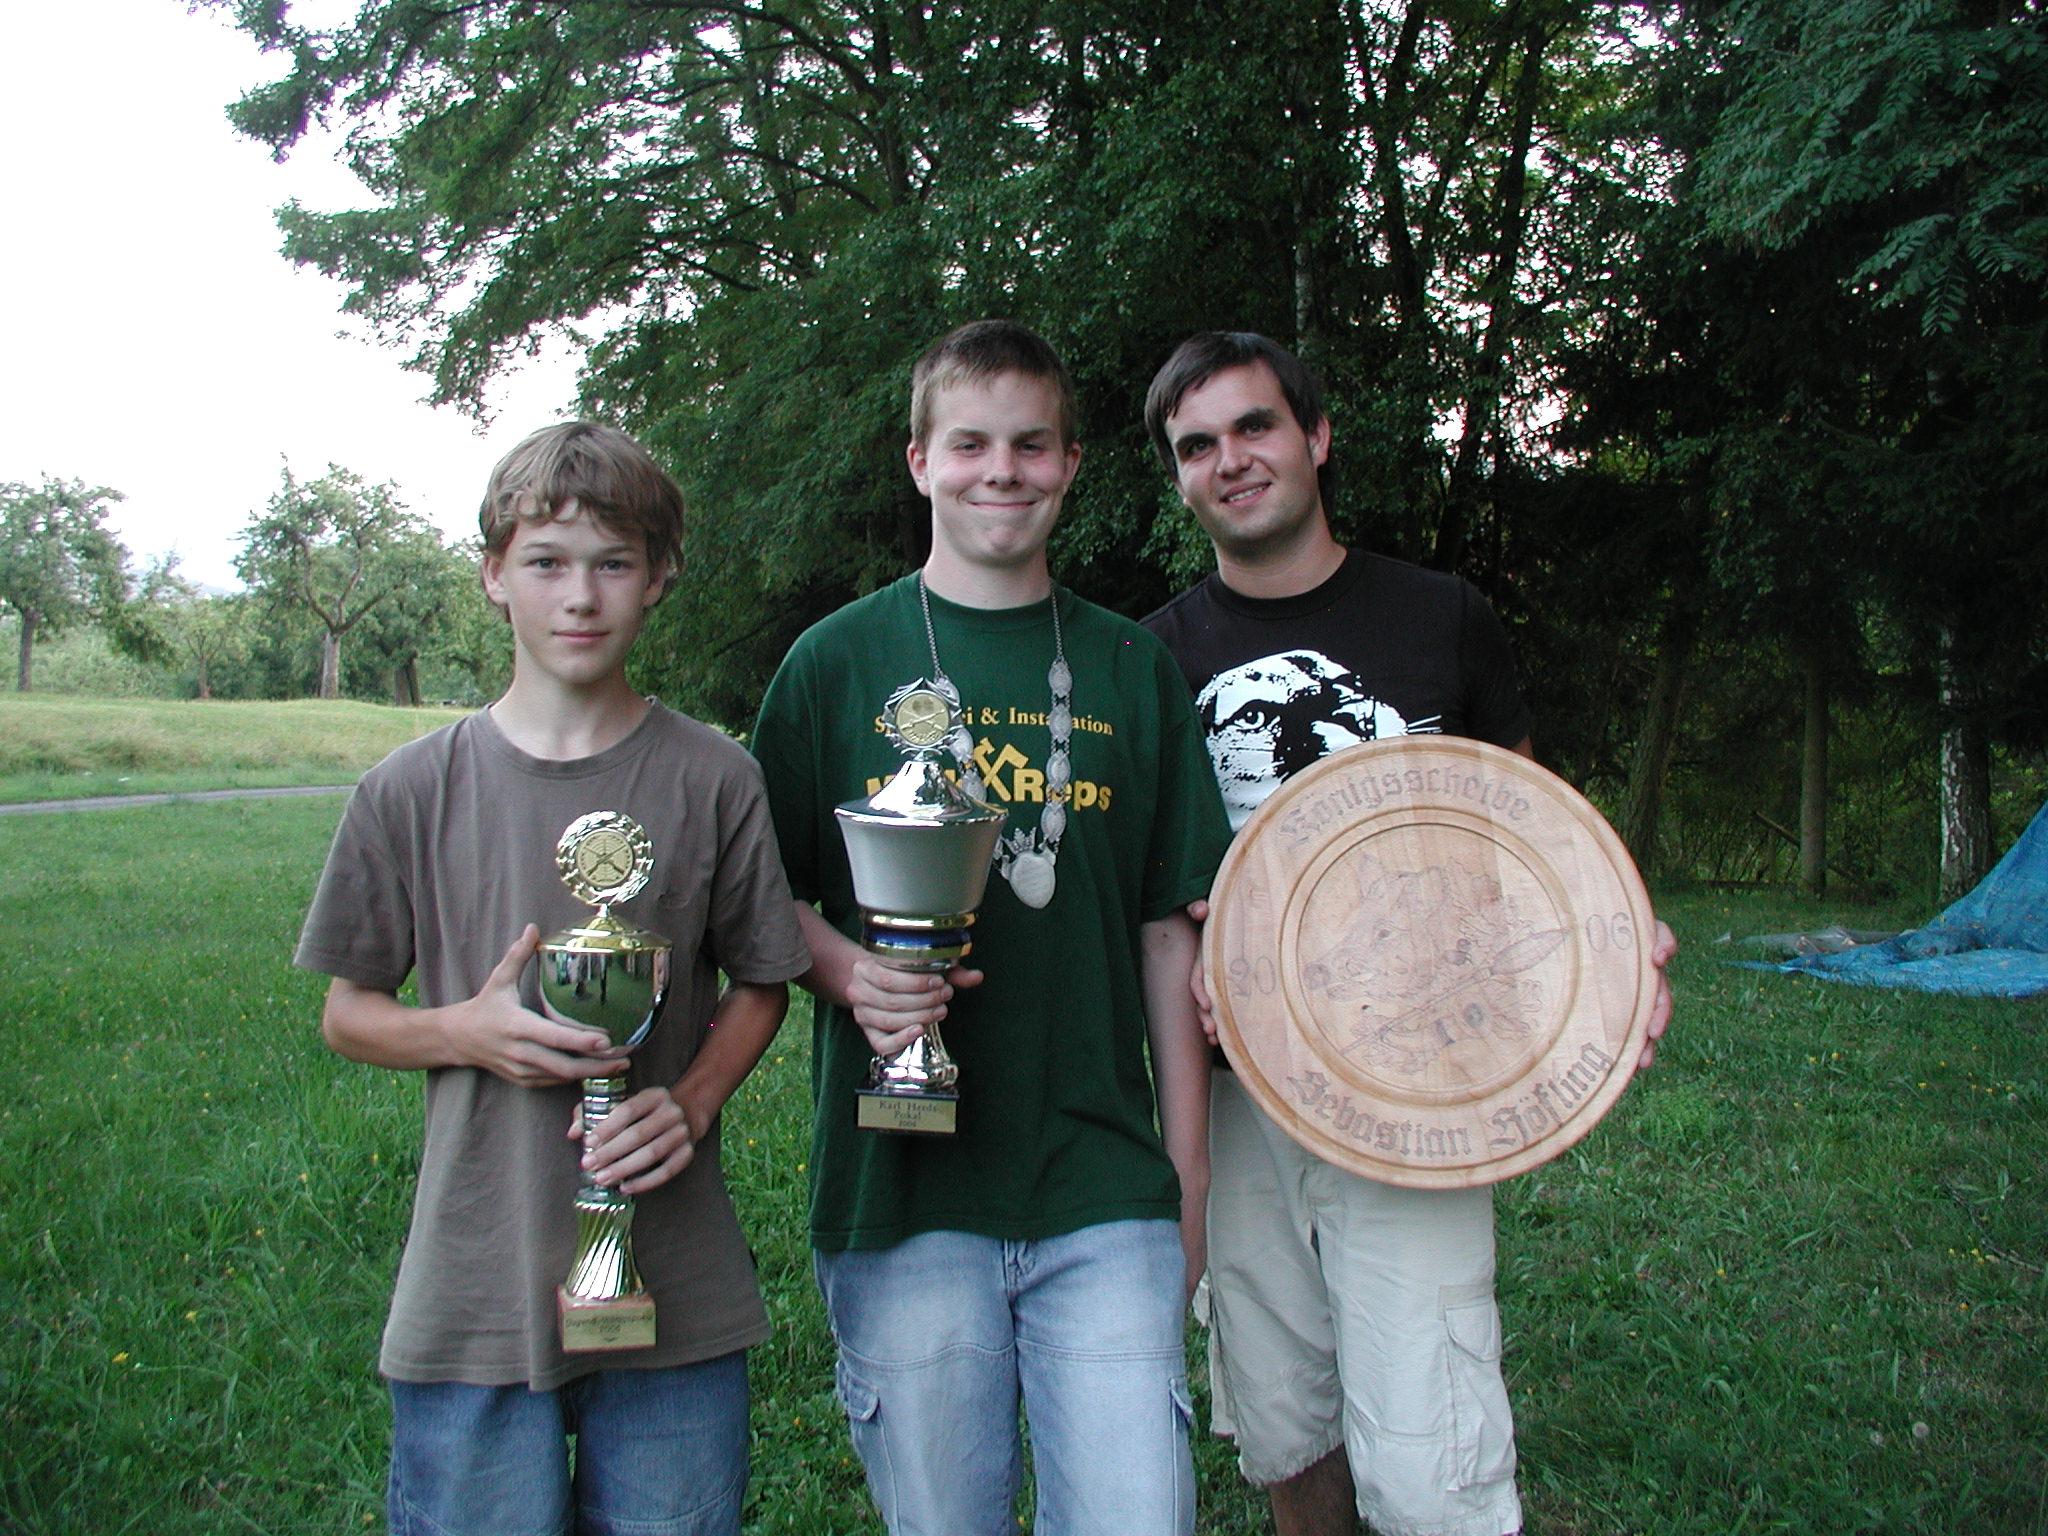 Jugendkönig 2006